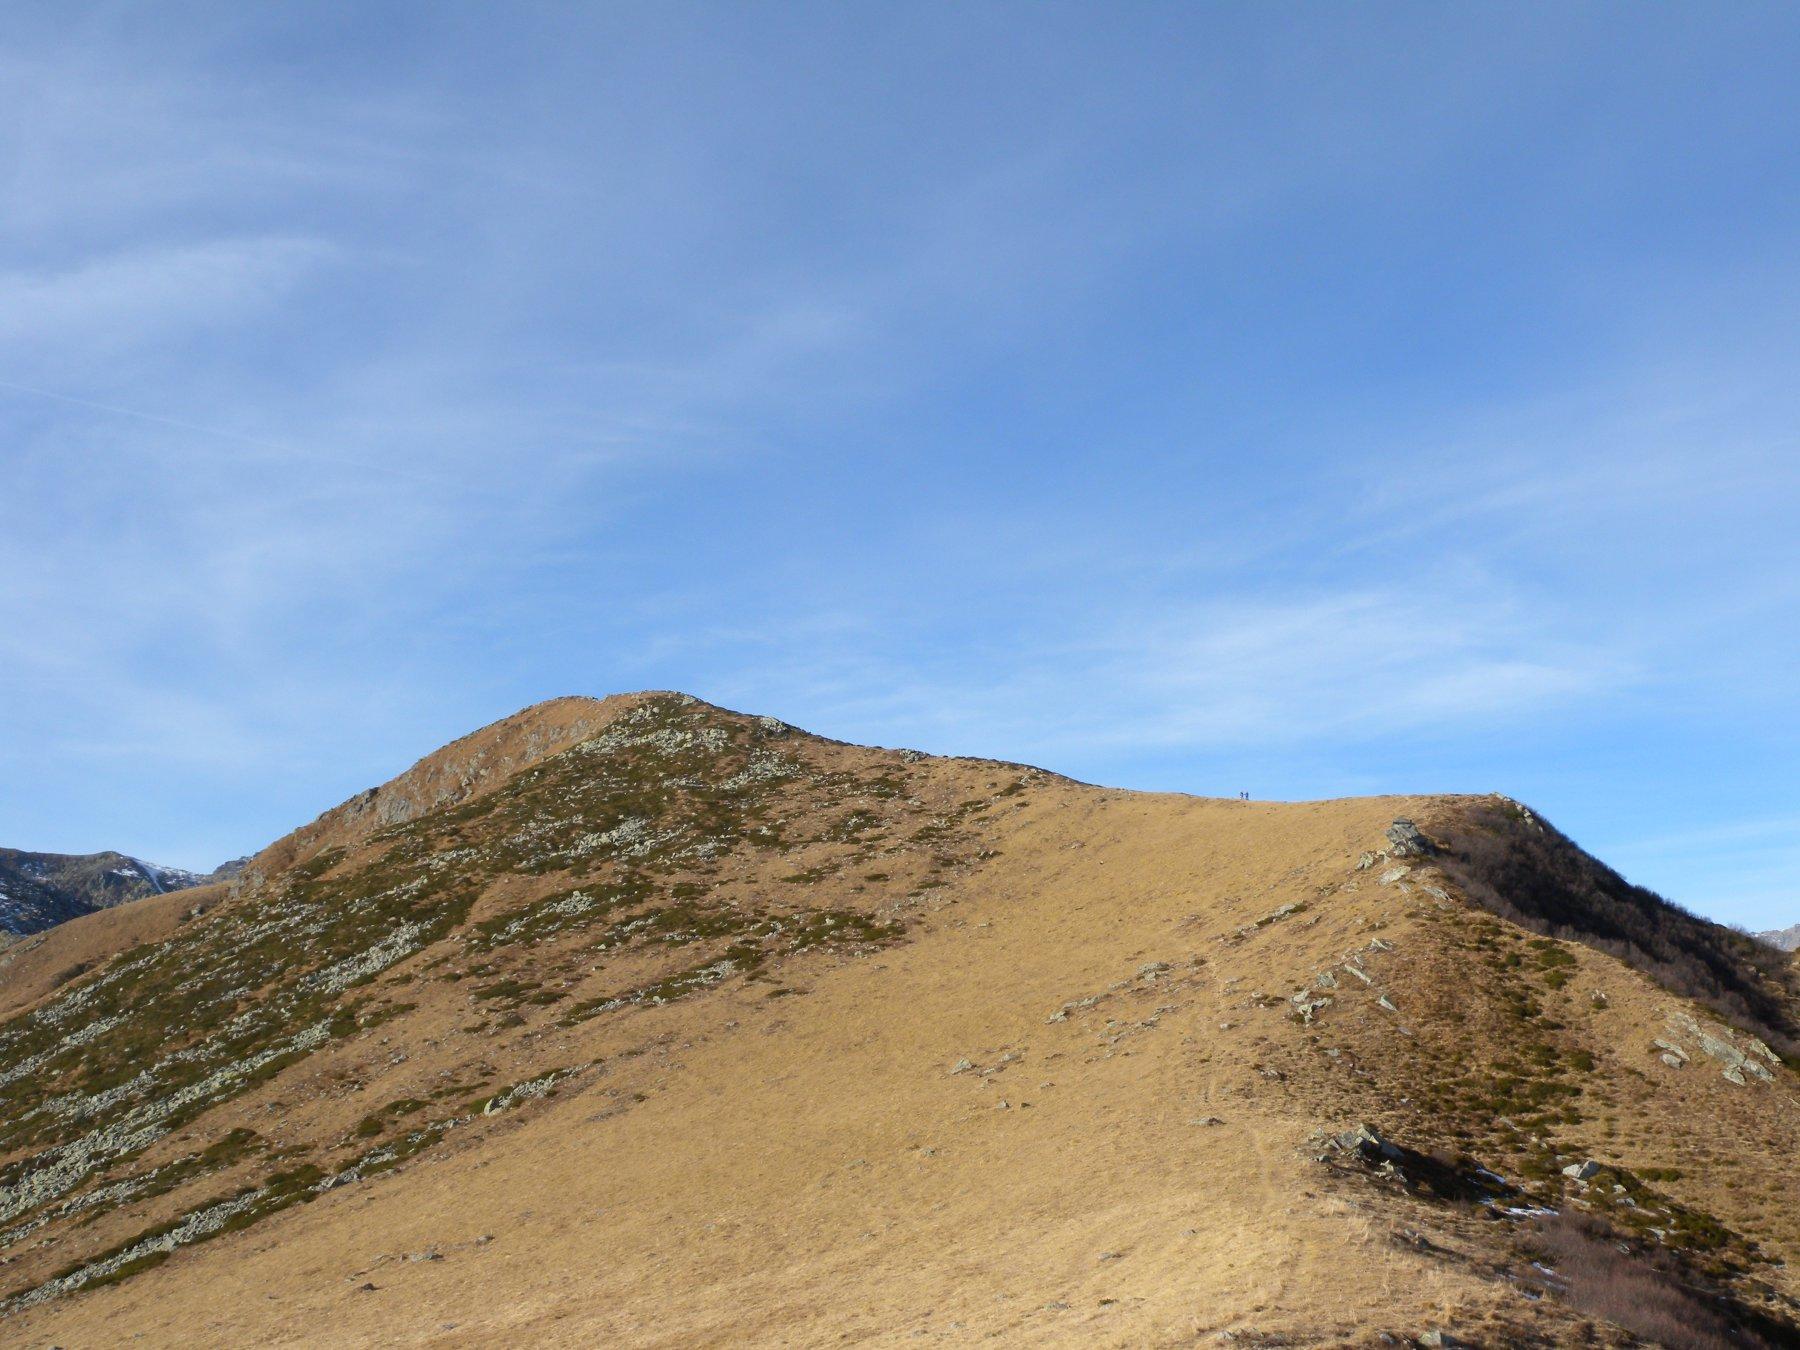 Marmottere (Monte) dall'Alpe Bianca 2015-12-16